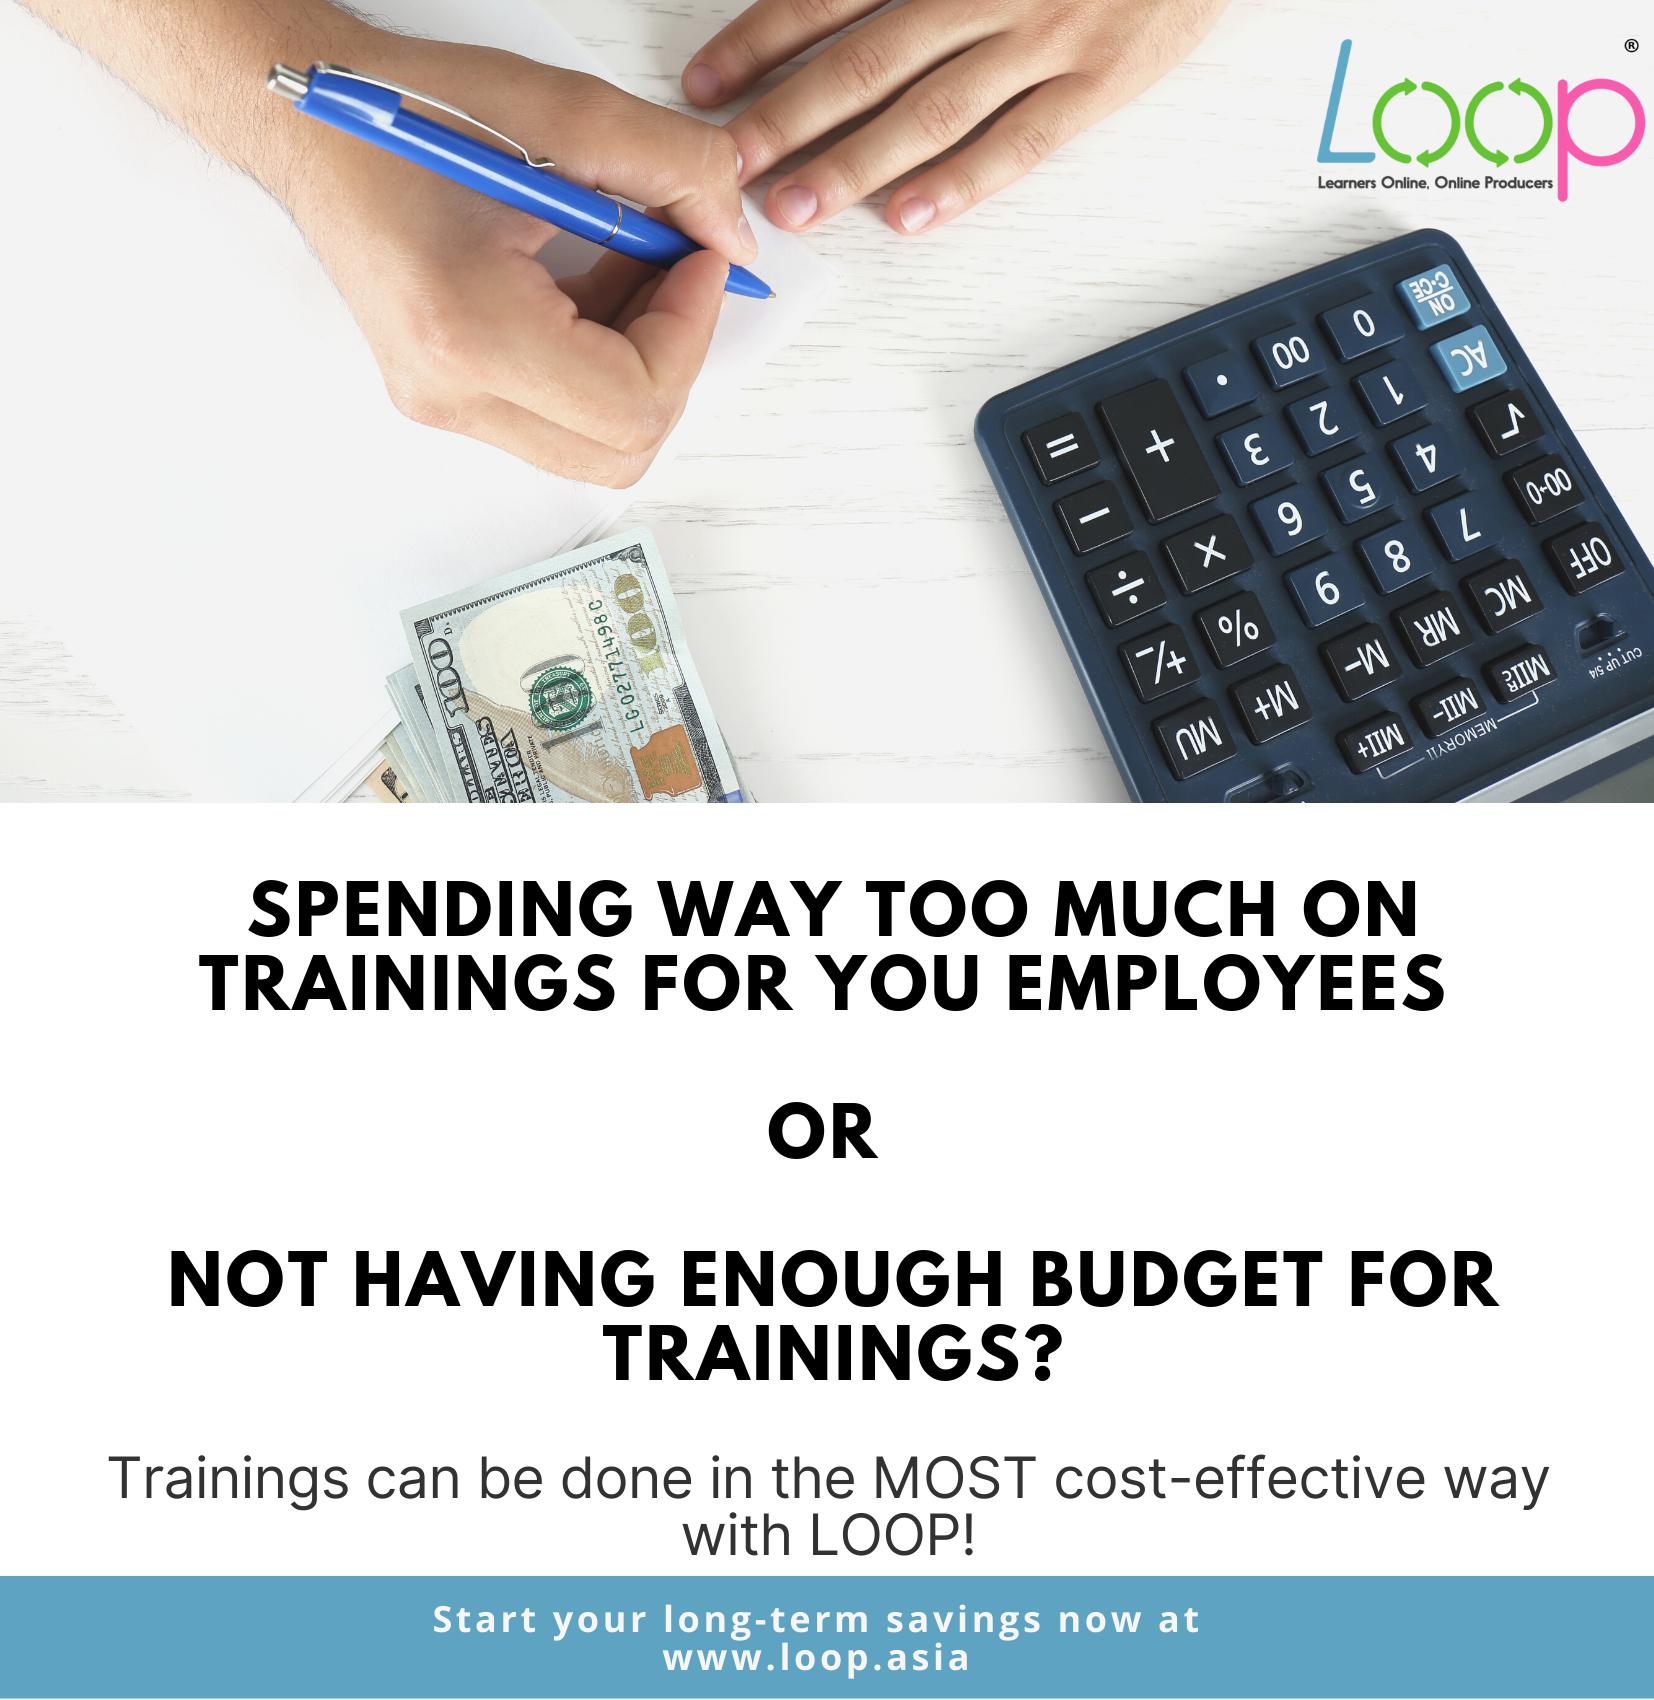 Start Having Cost-Effective Trainings!